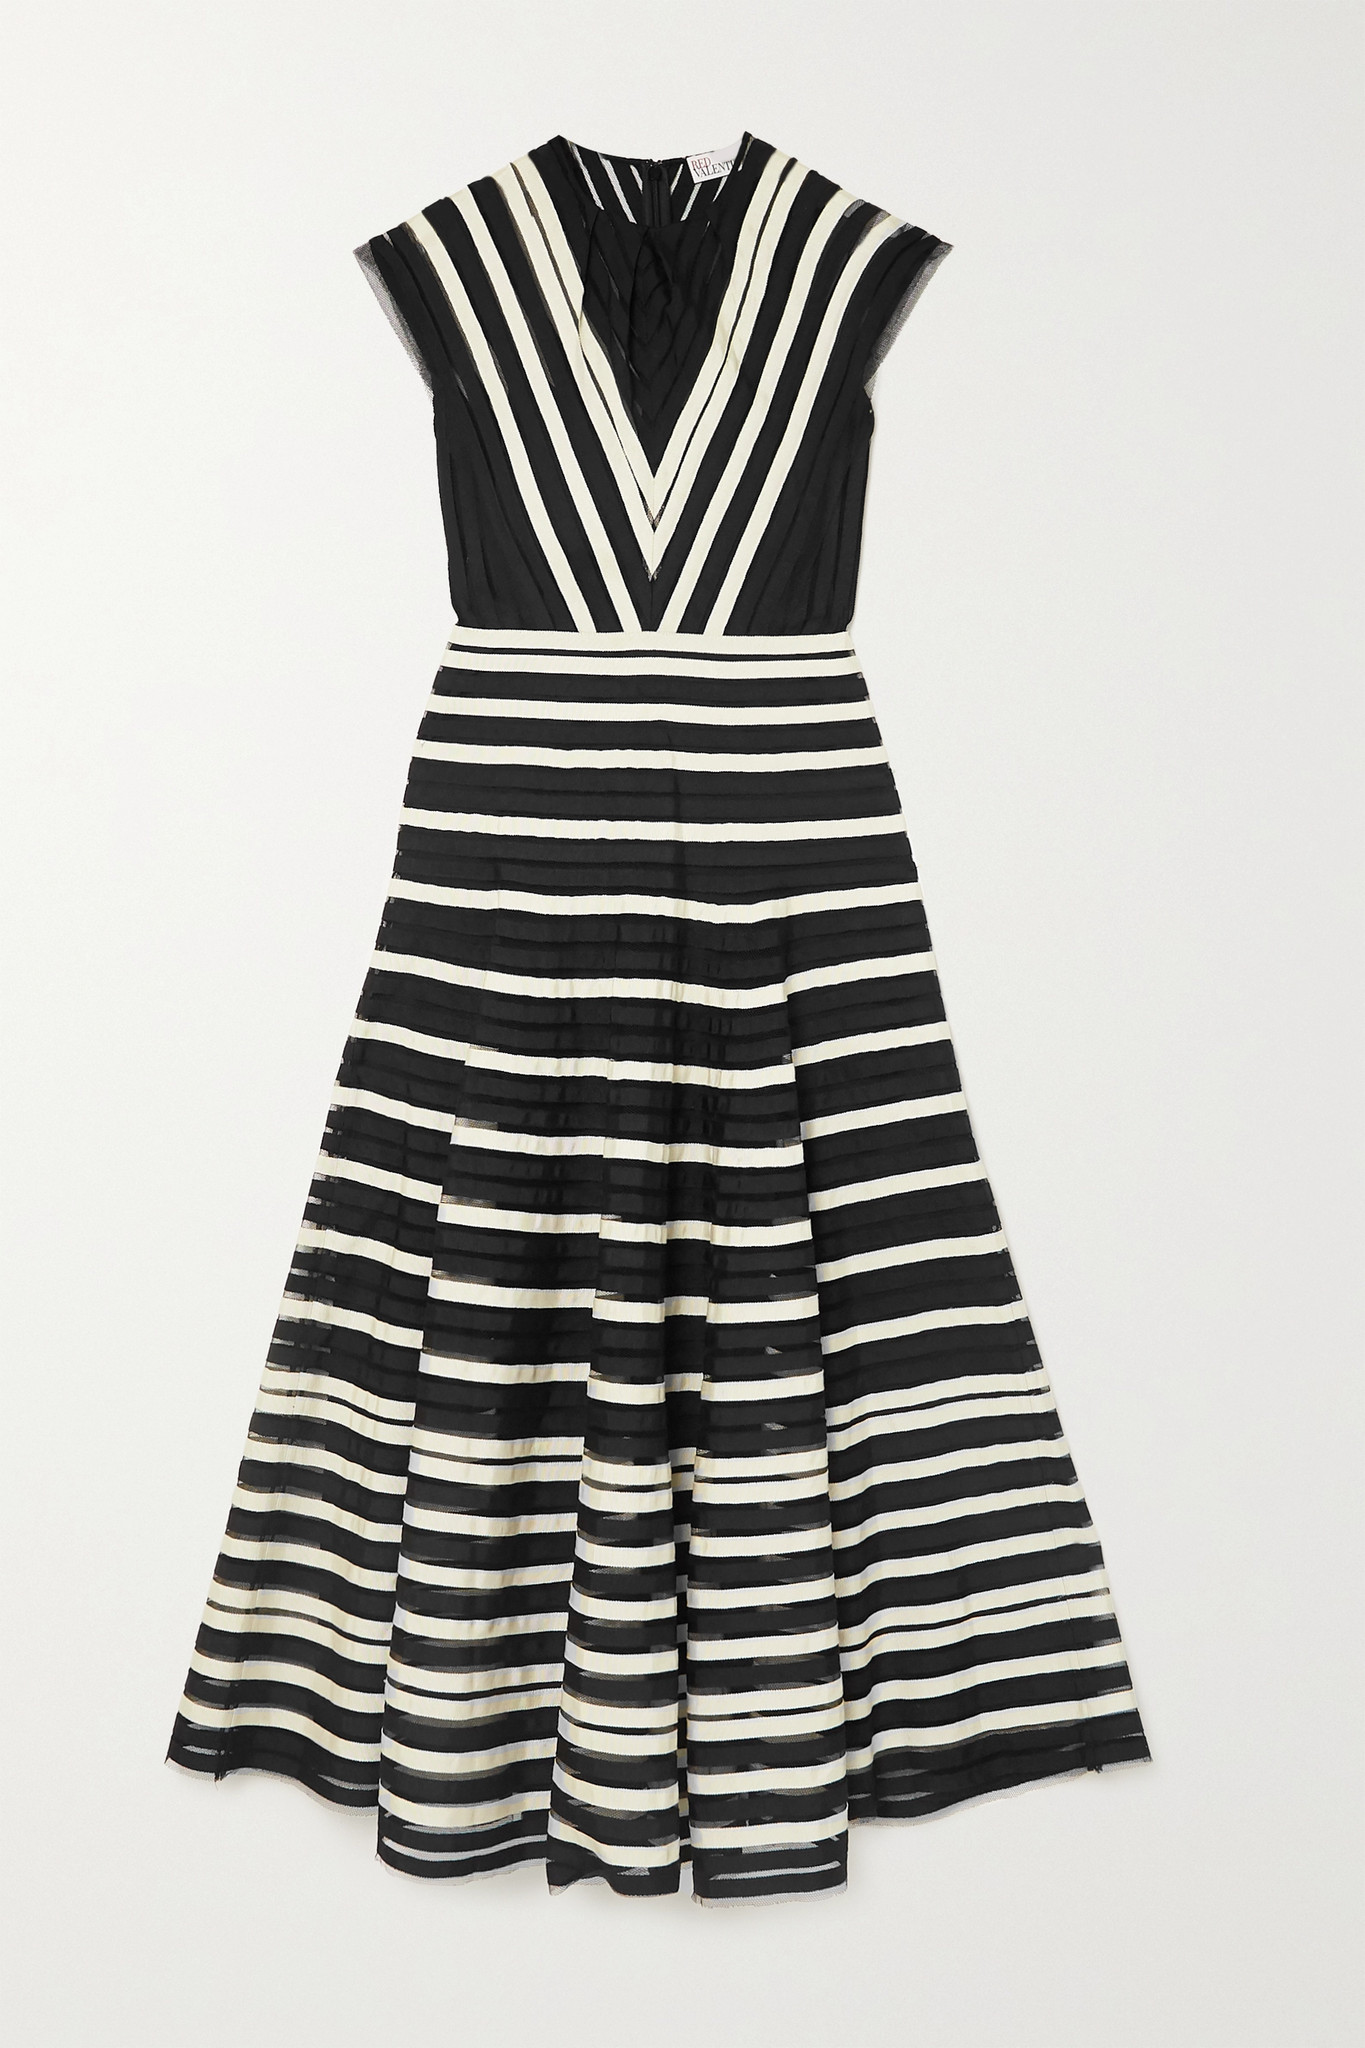 REDVALENTINO - Tulle And Grosgrain Midi Dress - Black - IT36